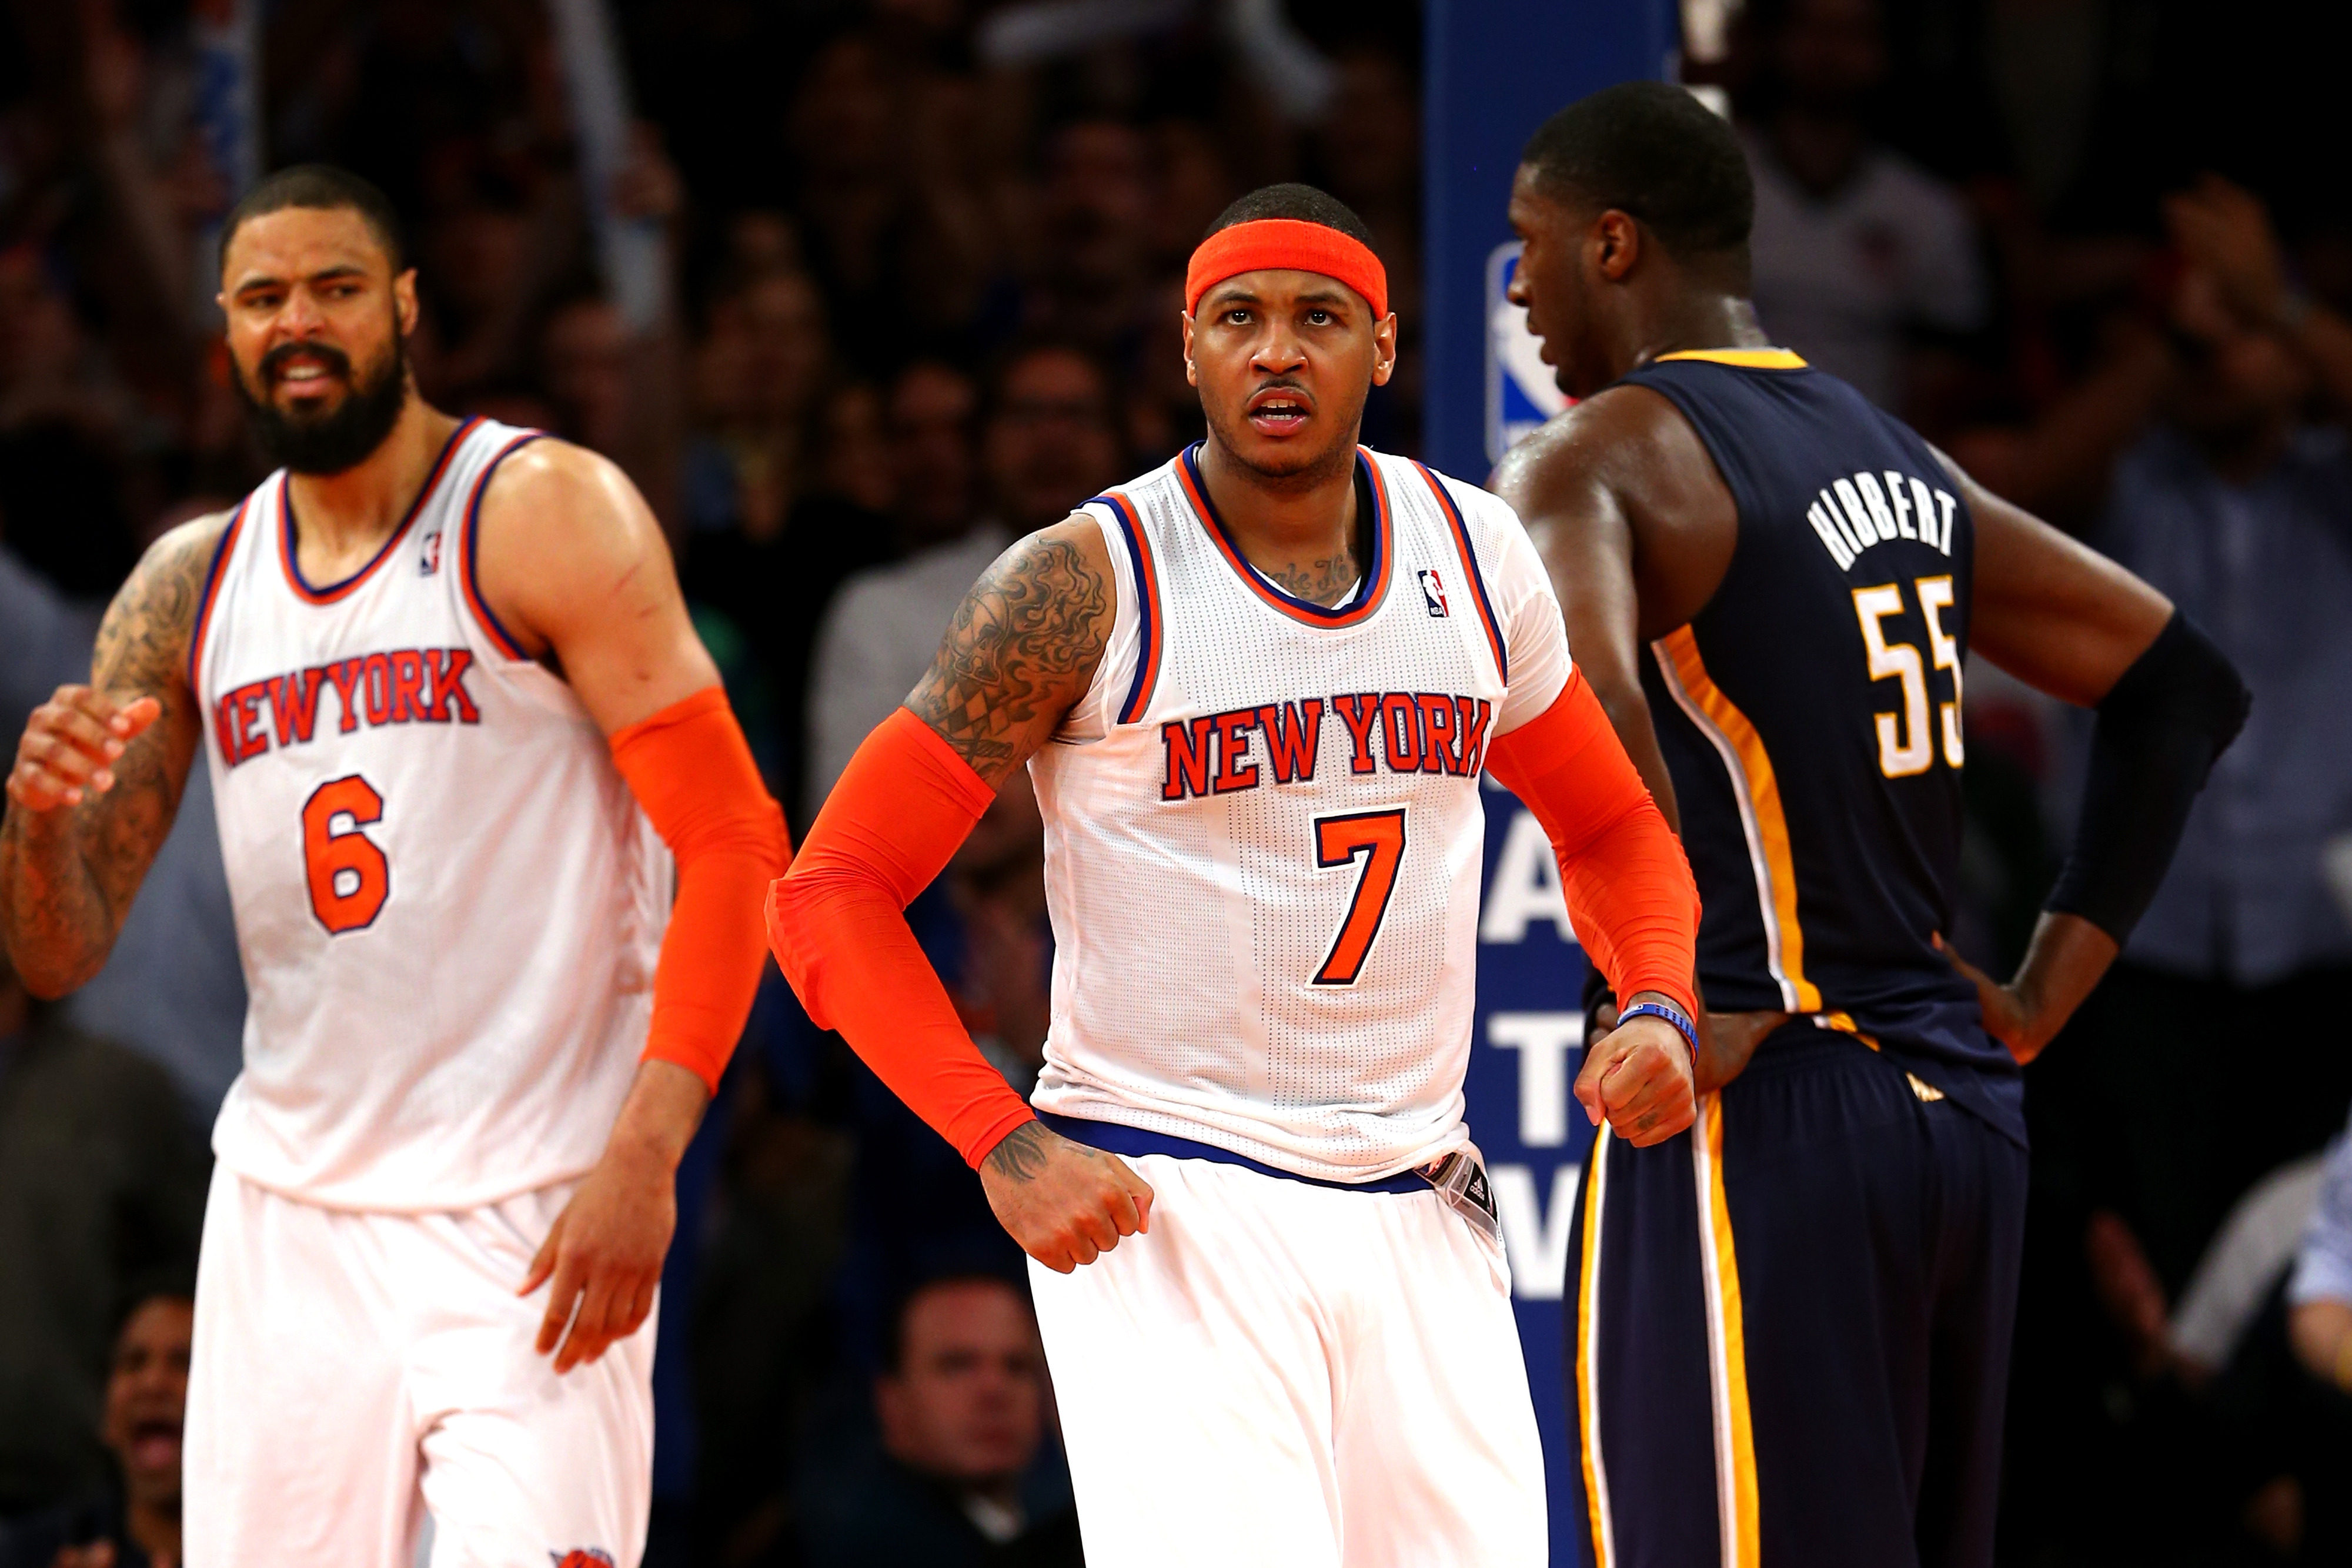 NBA Draft 2013: New York Knicks working with one pick